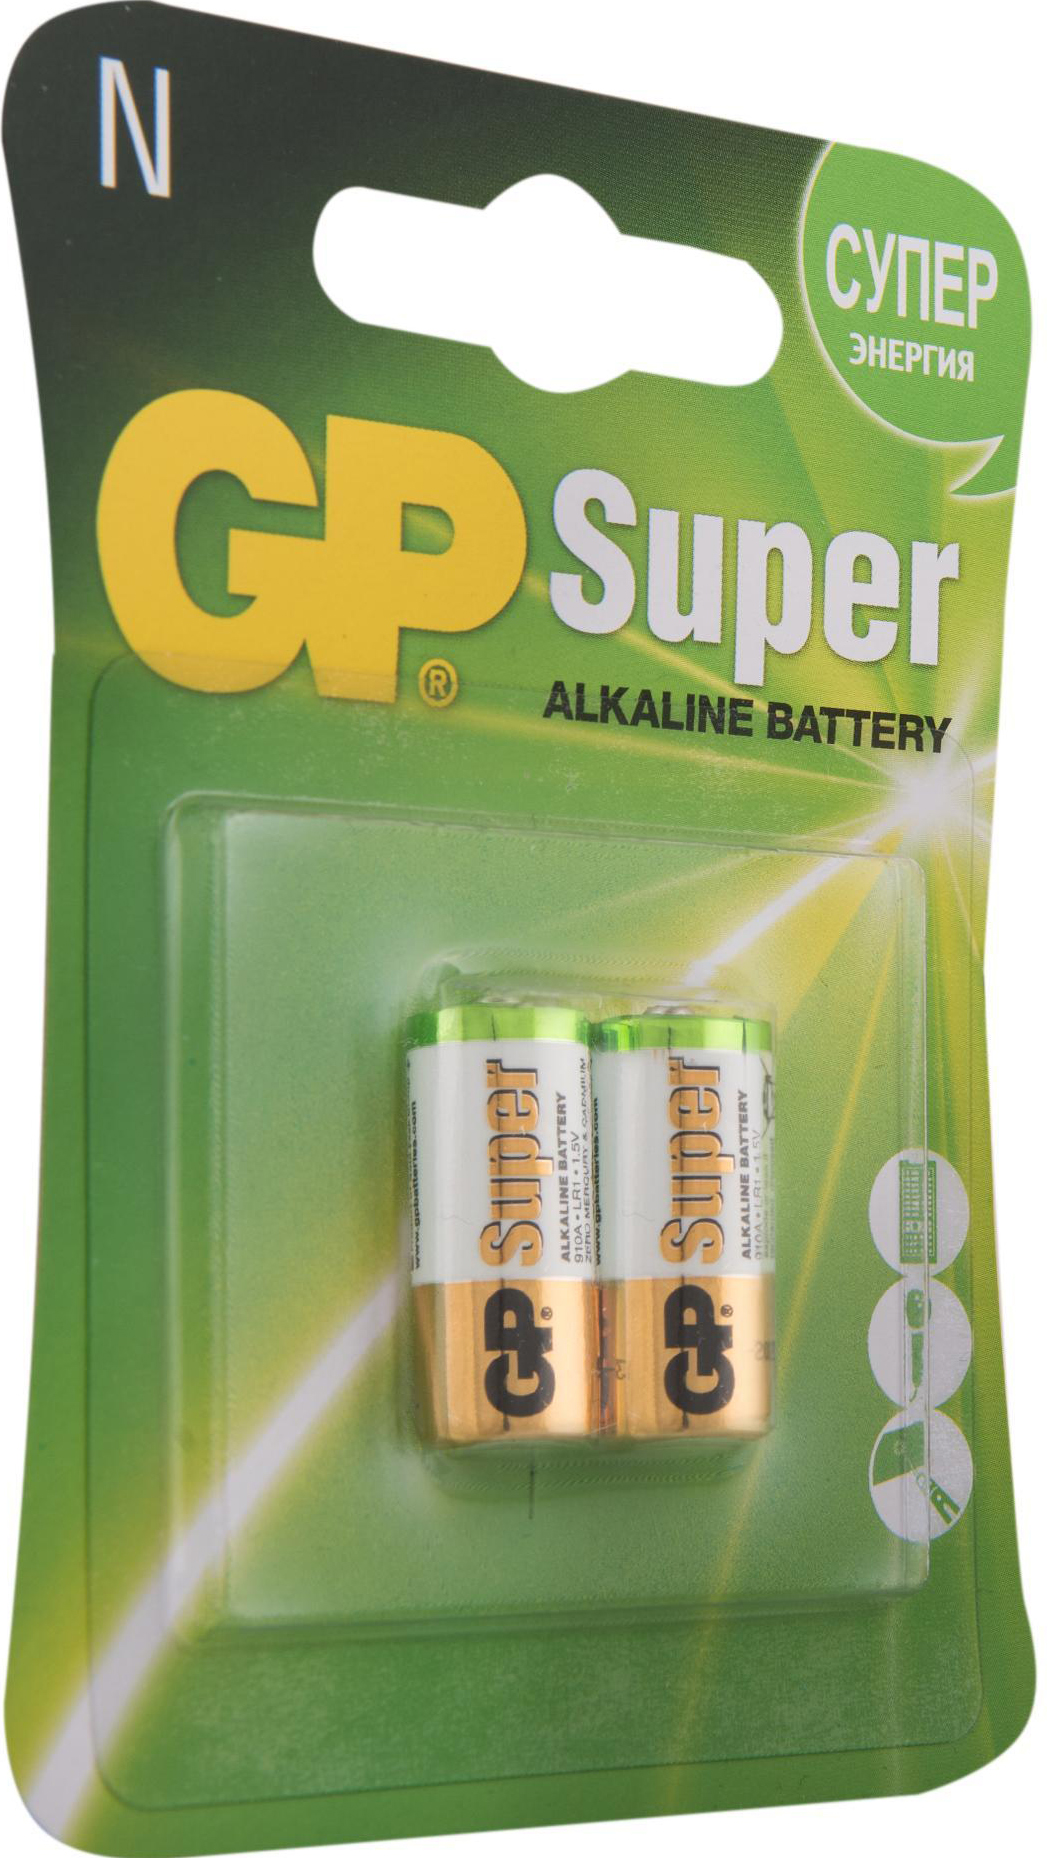 Фото - Алкалиновые батарейки GP Super Alkaline 910A типоразмера N (Блистер, 2 шт) алкалиновые батарейки gp ultra alkaline 13а типоразмера d блистер 2 шт